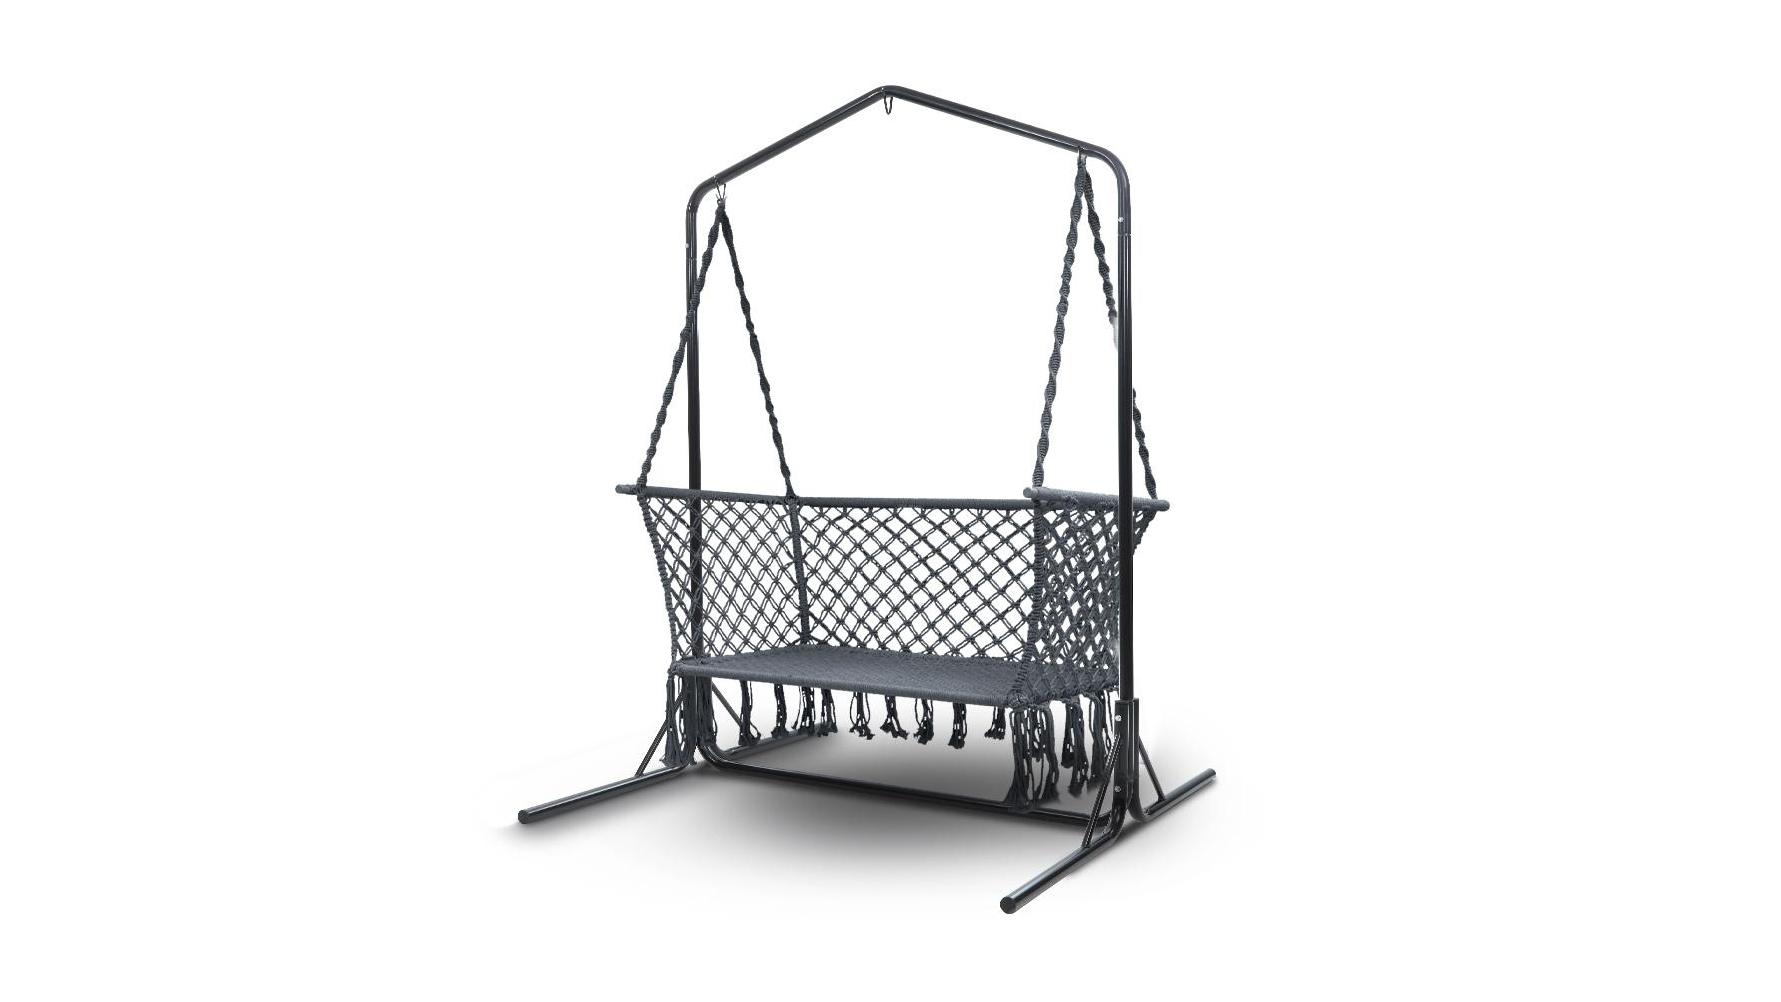 Gardeon Outdoor Swing Hammock Chair With Stand Grey